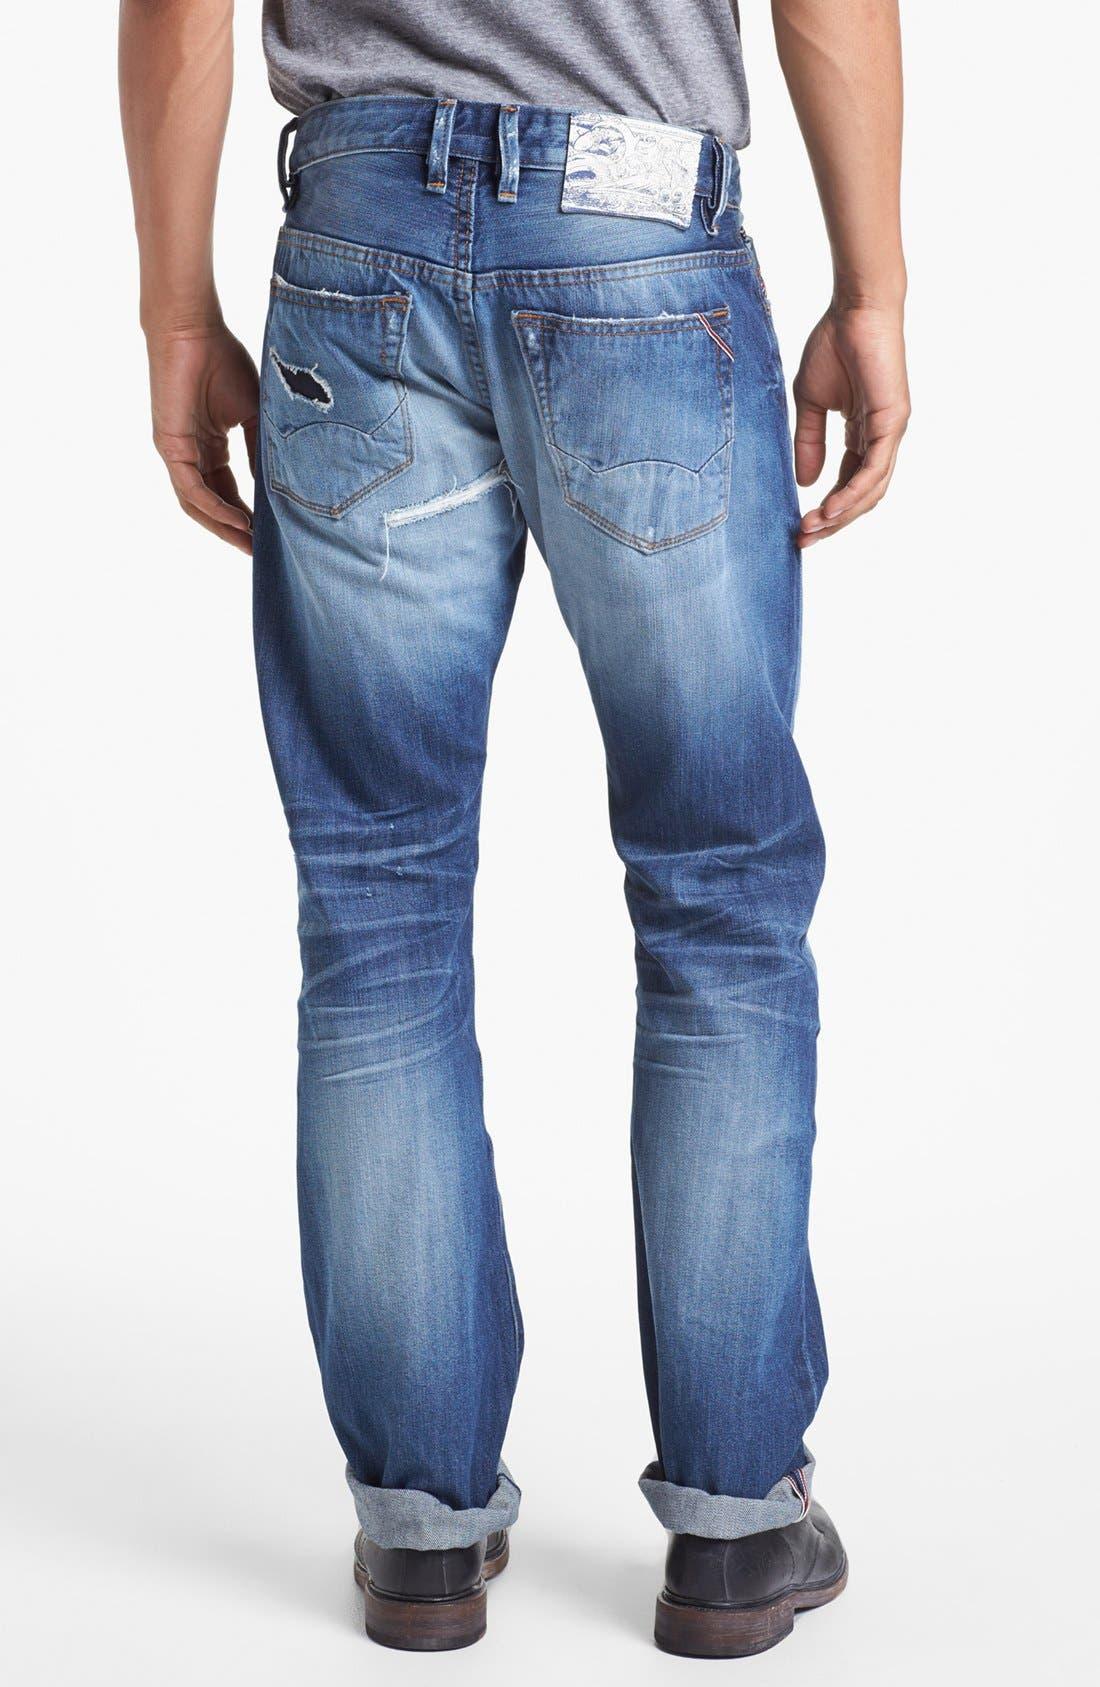 Main Image - Cult of Individuality 'Rebel' Straight Leg Selvedge Jeans (Riverside)